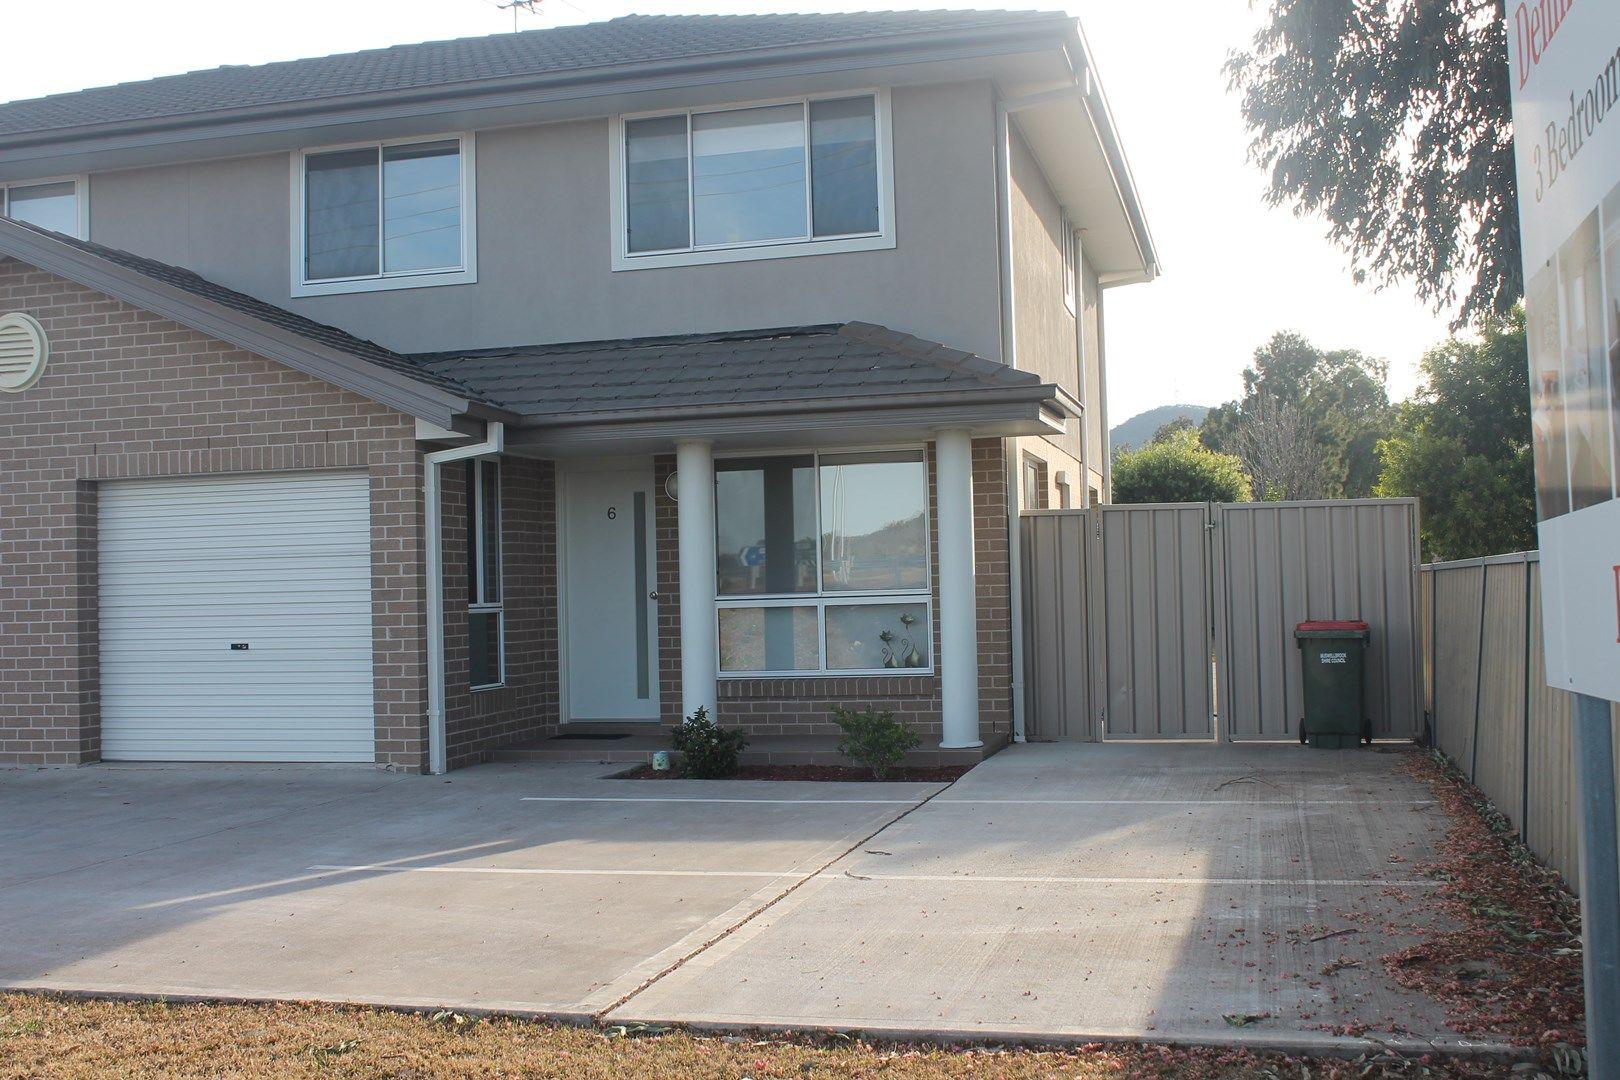 6/2 Crinoline, Denman NSW 2328, Image 1